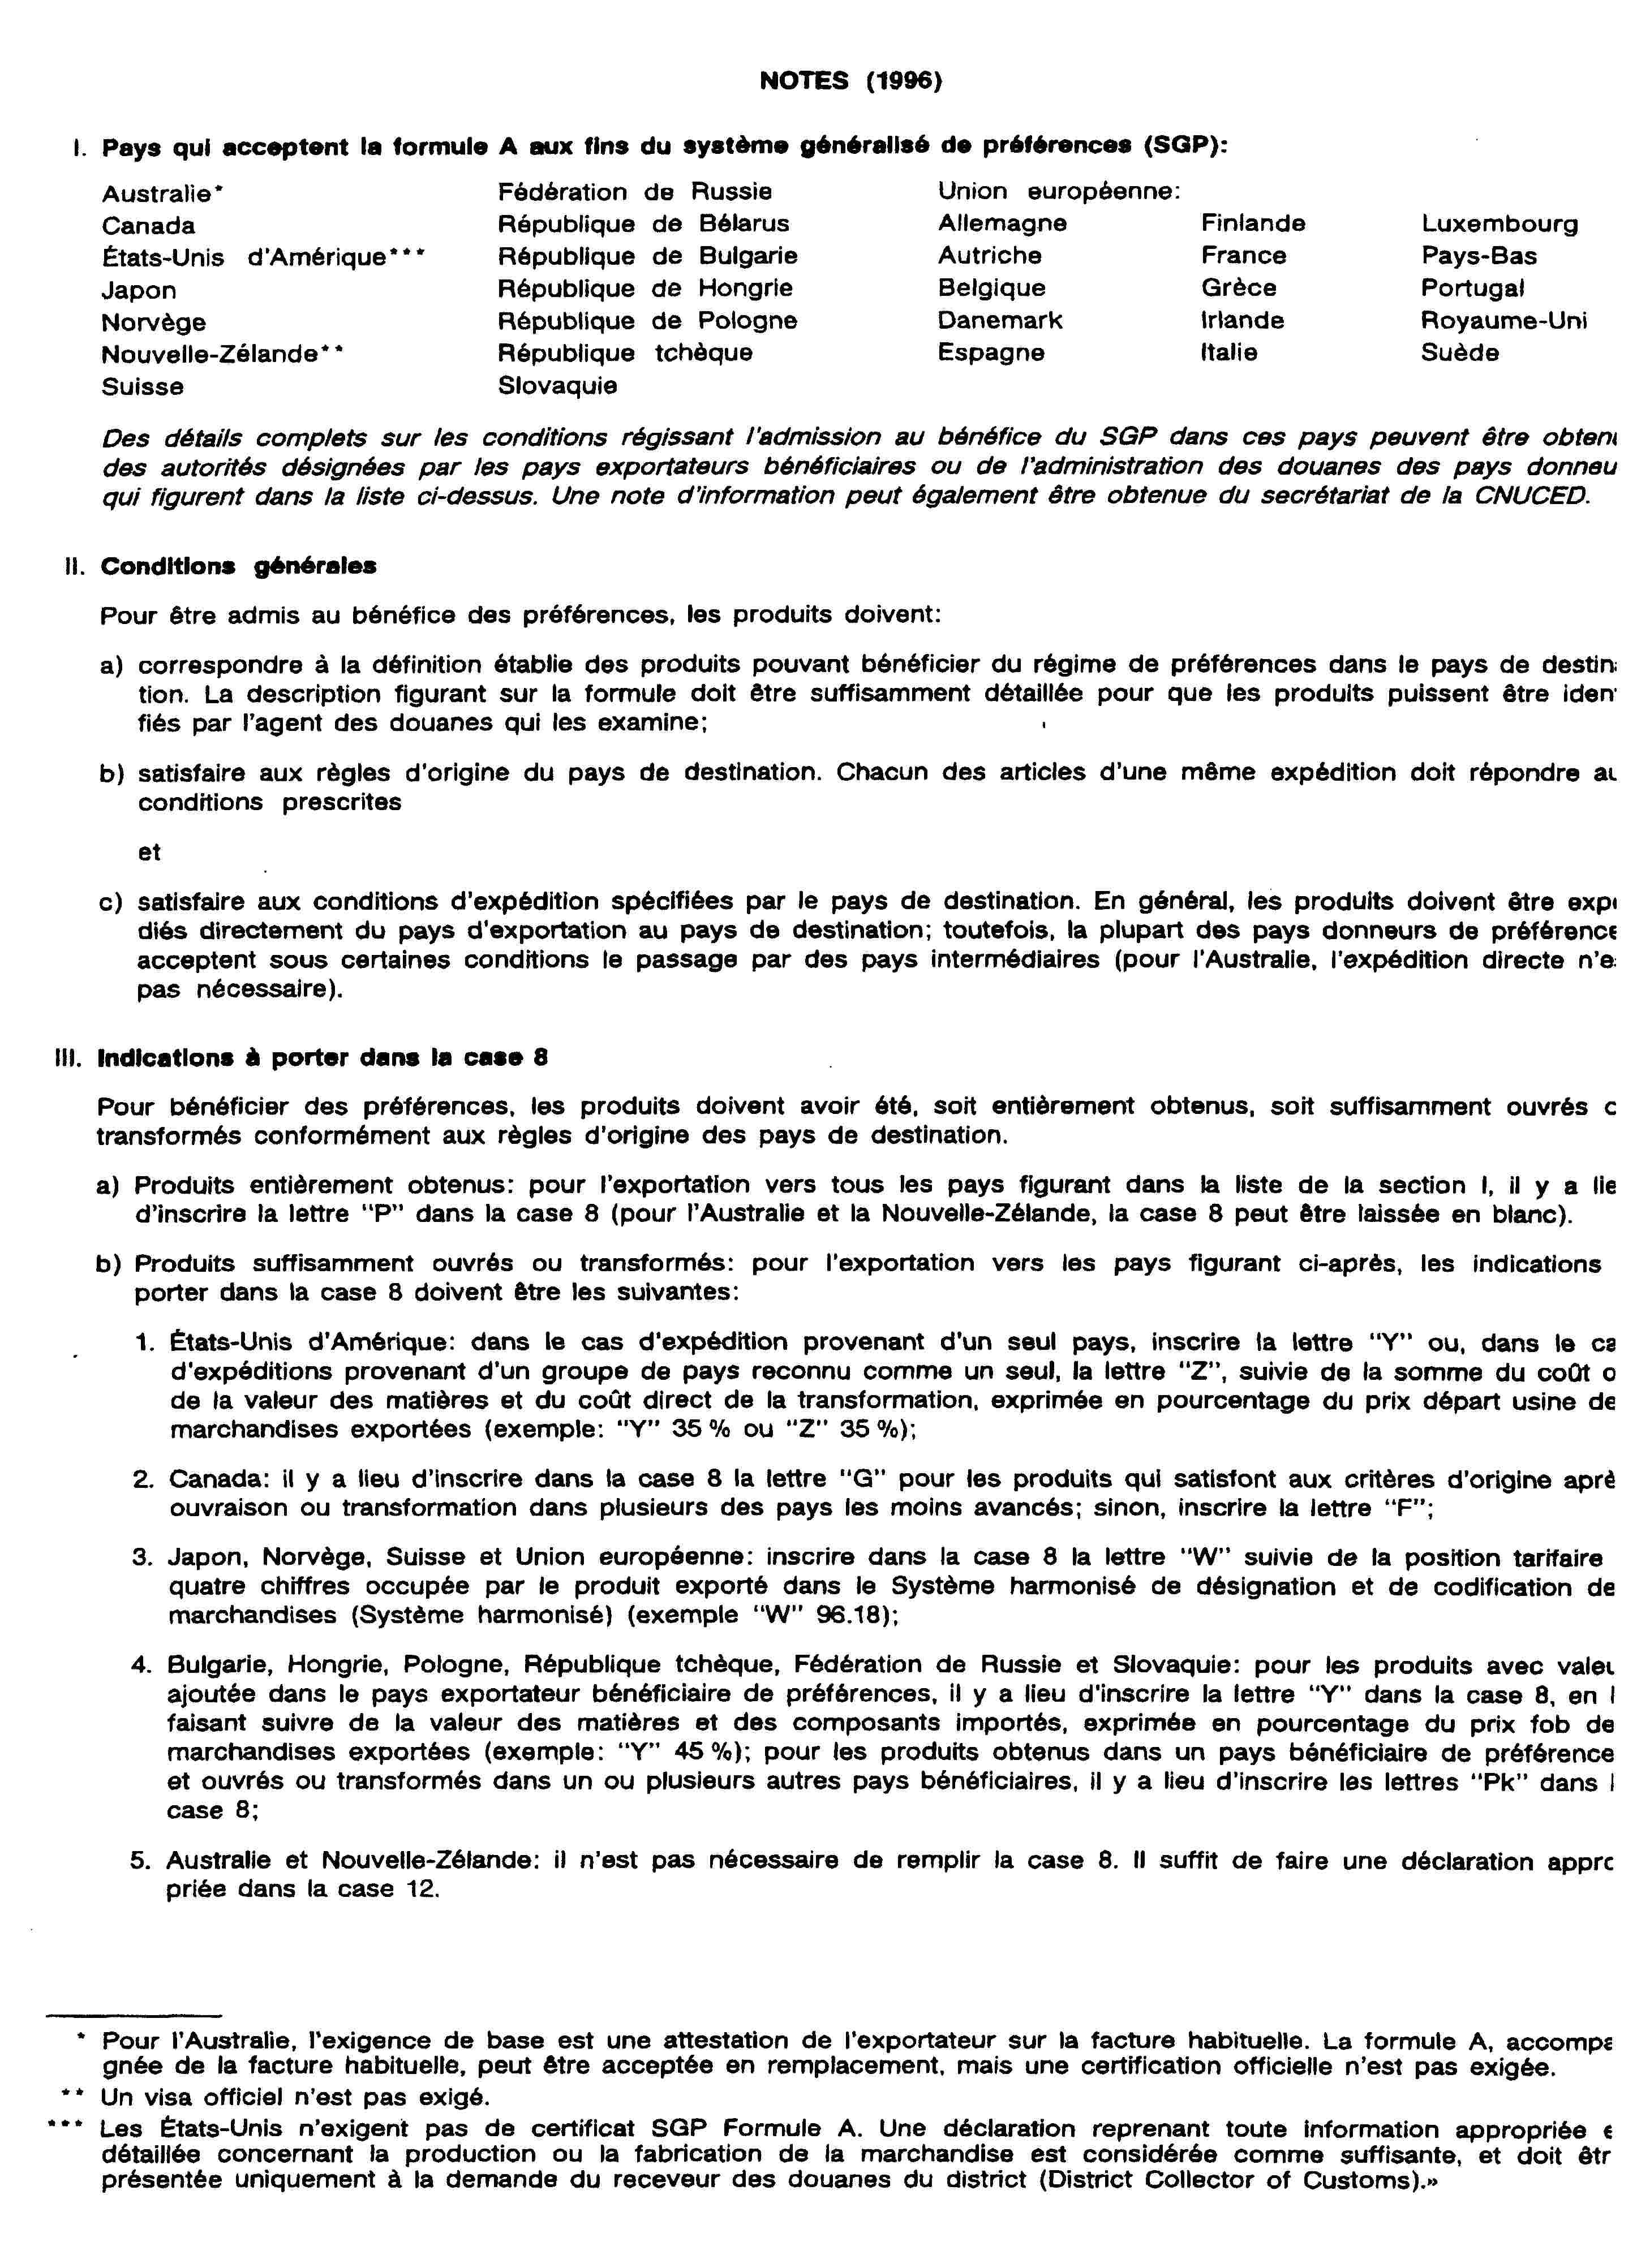 EUR-Lex - 01993R2454-20060101 - EN - EUR-Lex